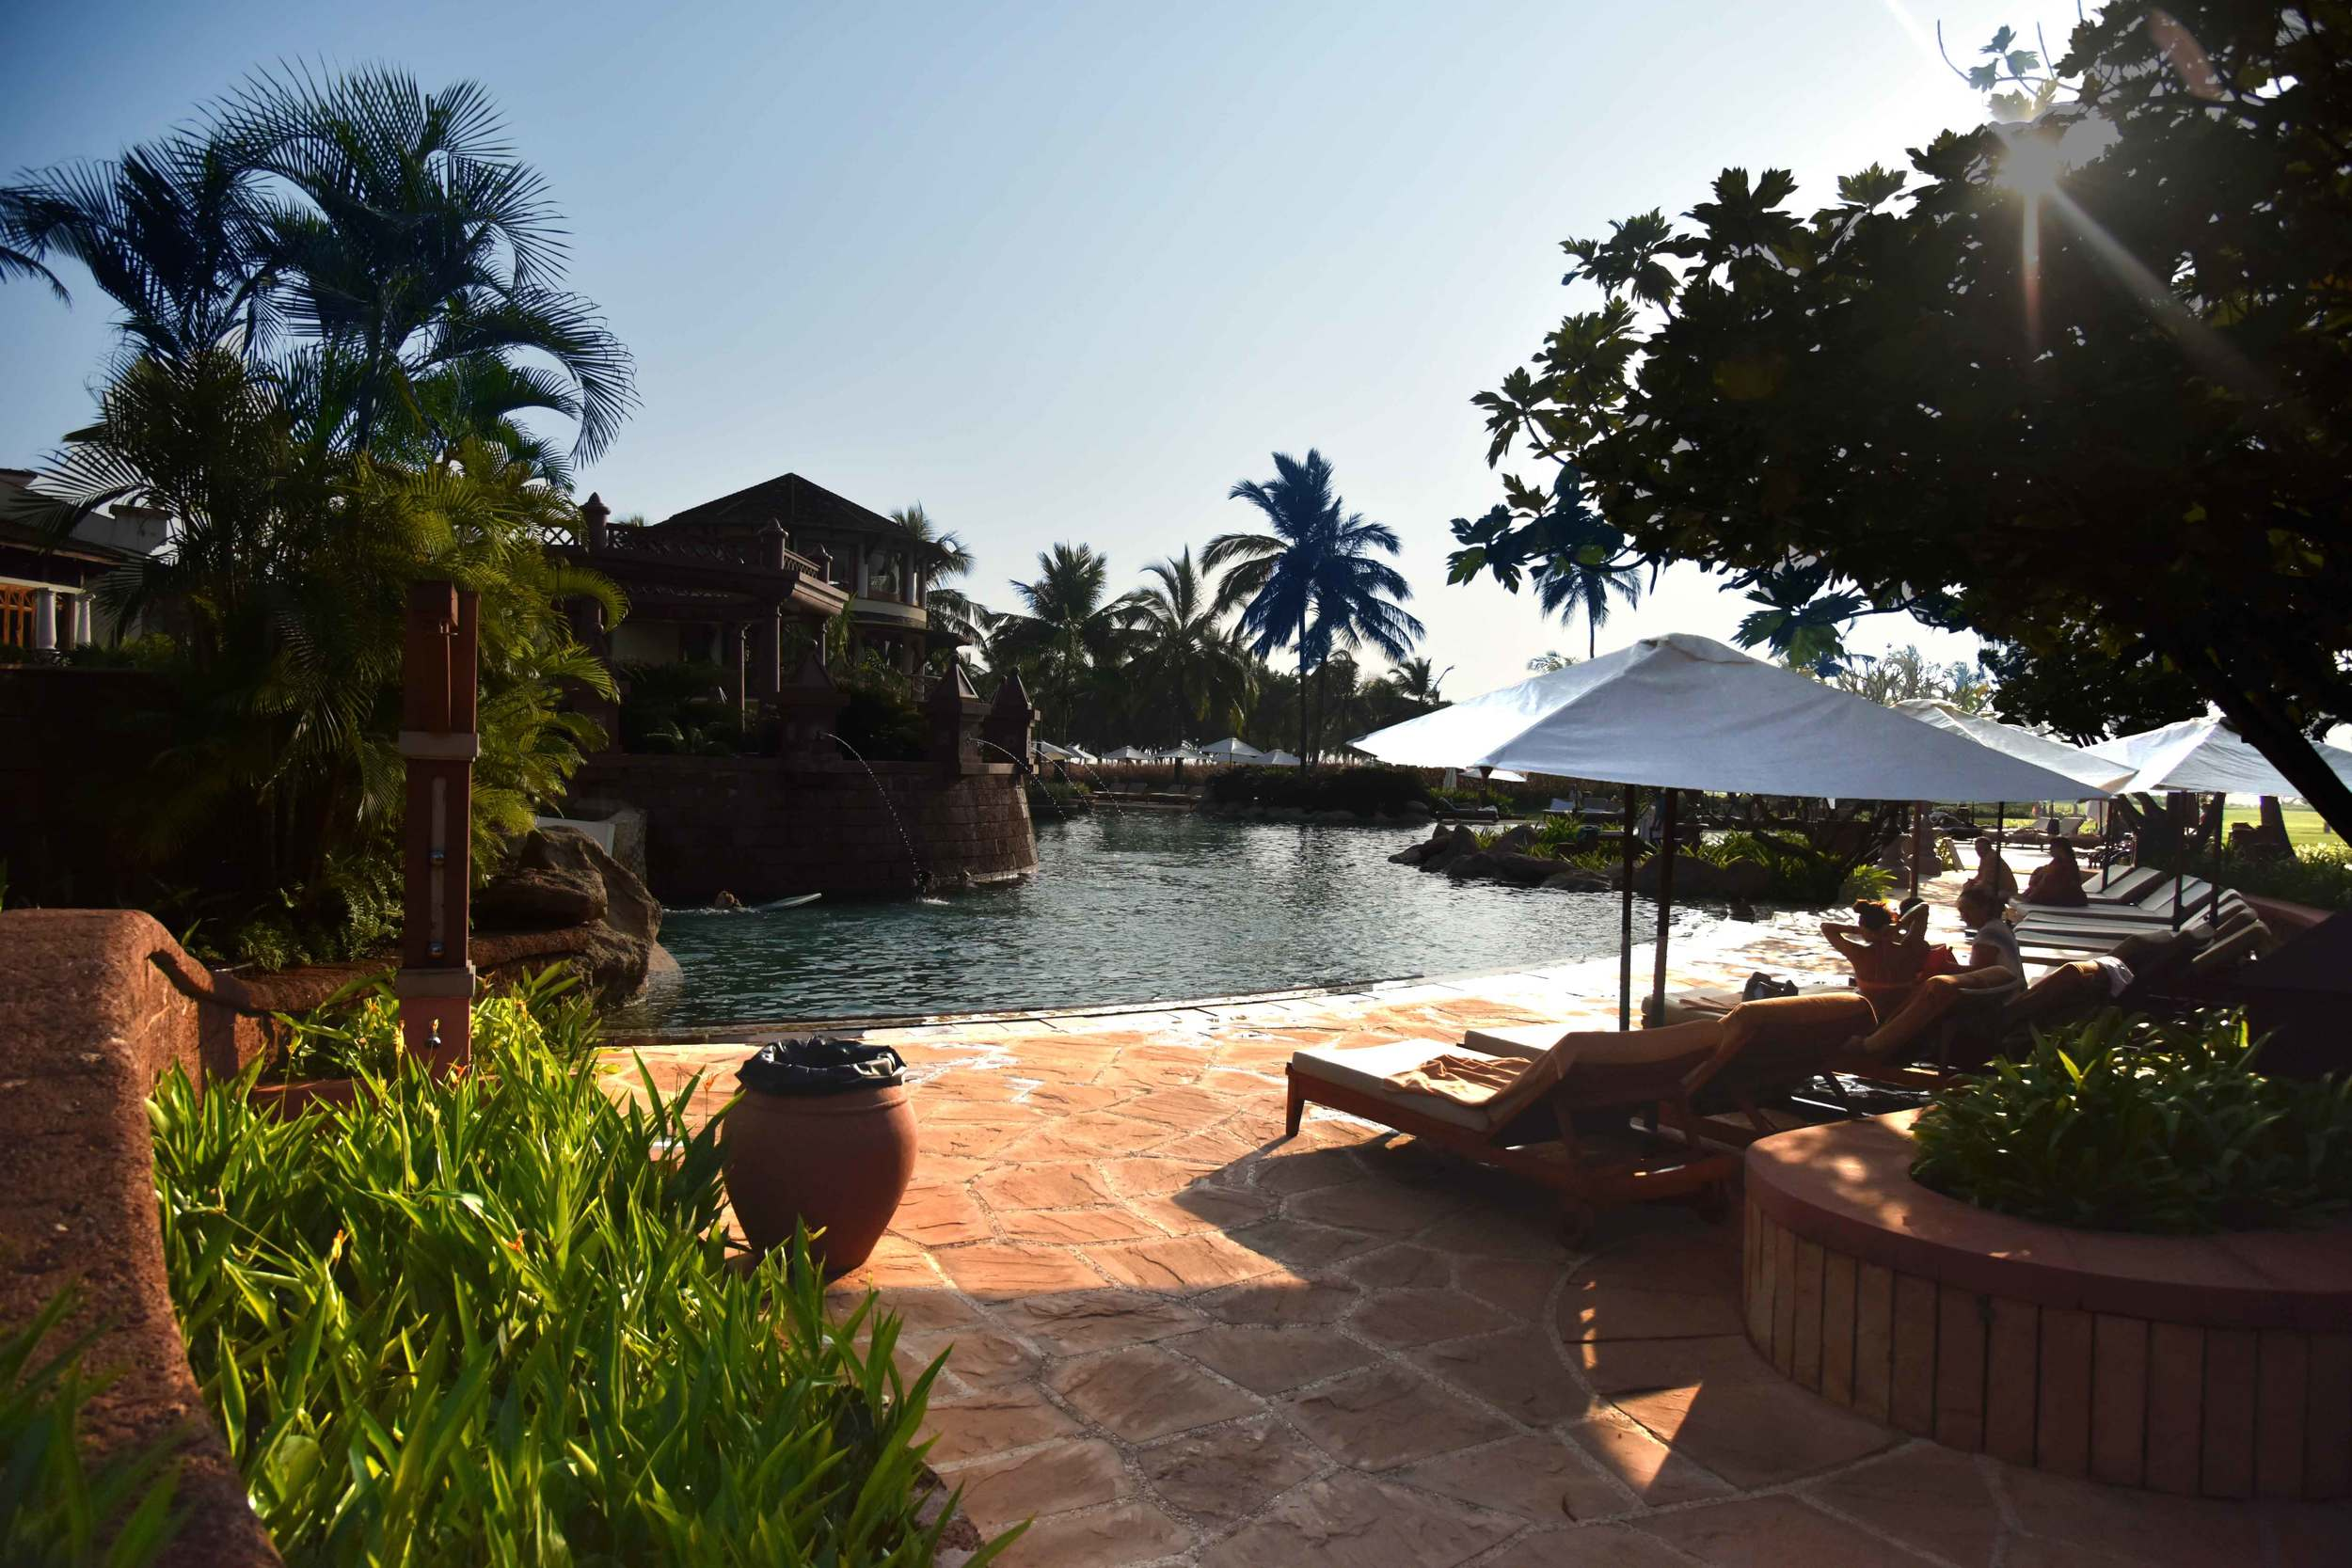 Sun bathing,Park Hyatt, Goa, India, 5 star hotel, luxury beach resort, spa. Image©thingstodot.com